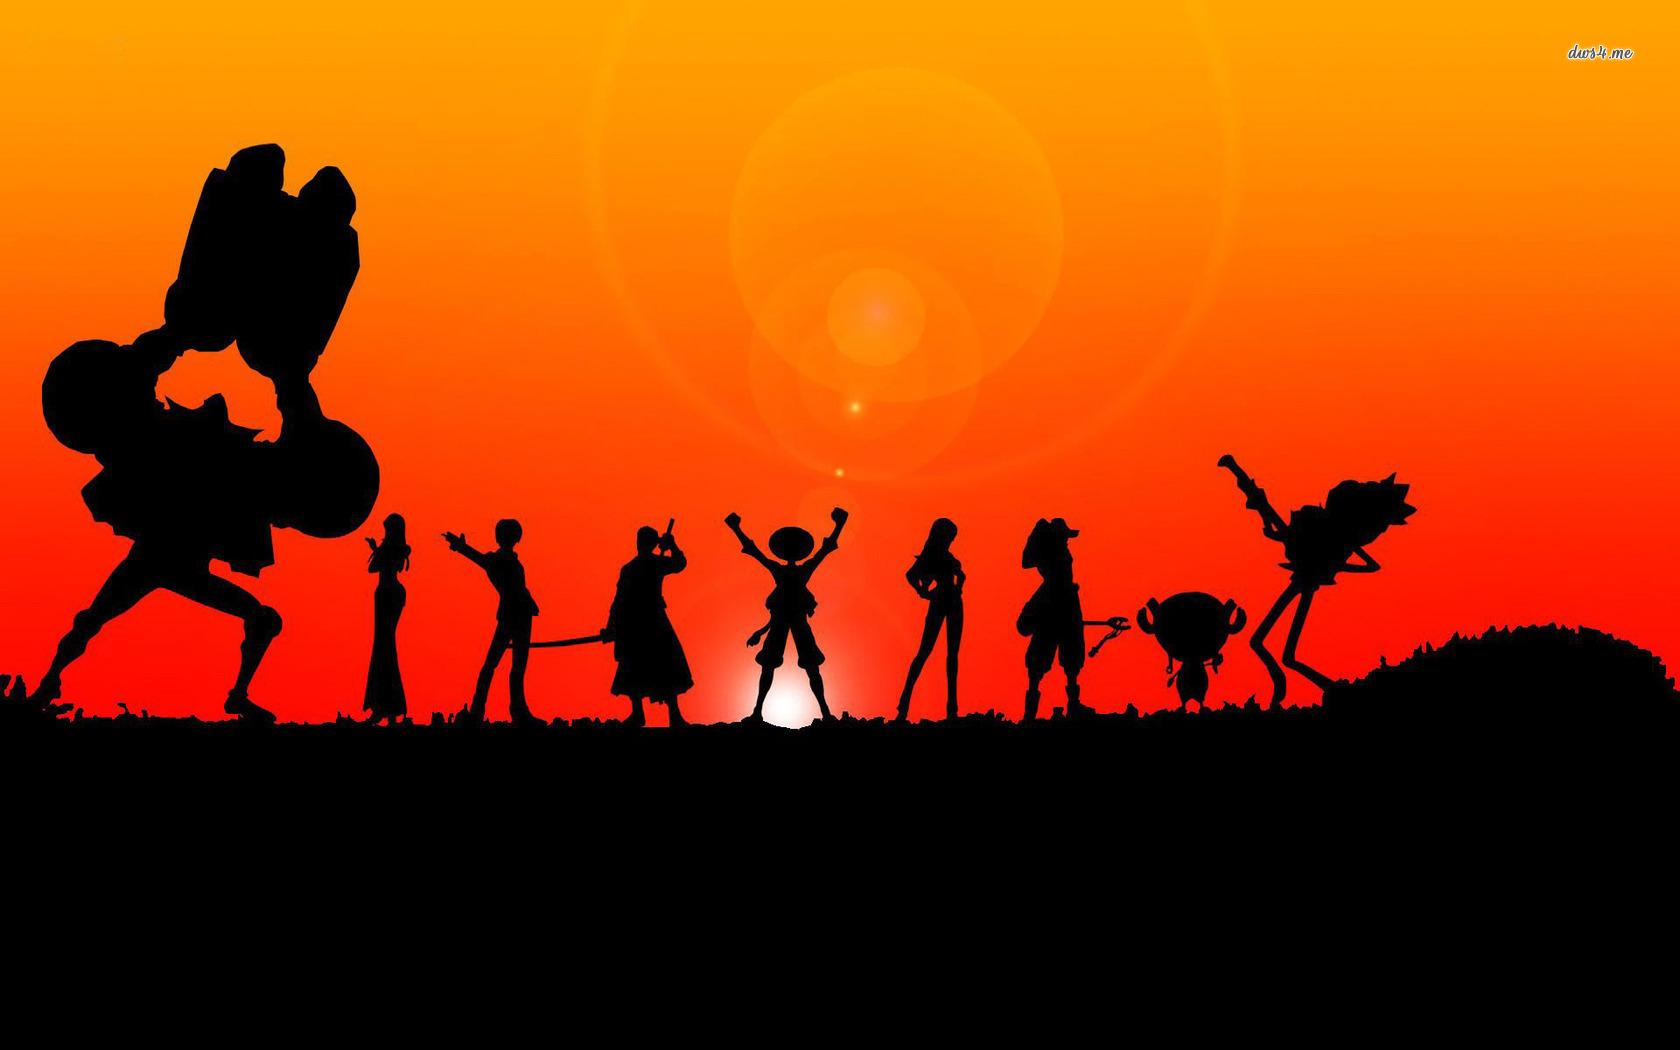 Free Download One Piece Desktop Wallpaper 1680x1050